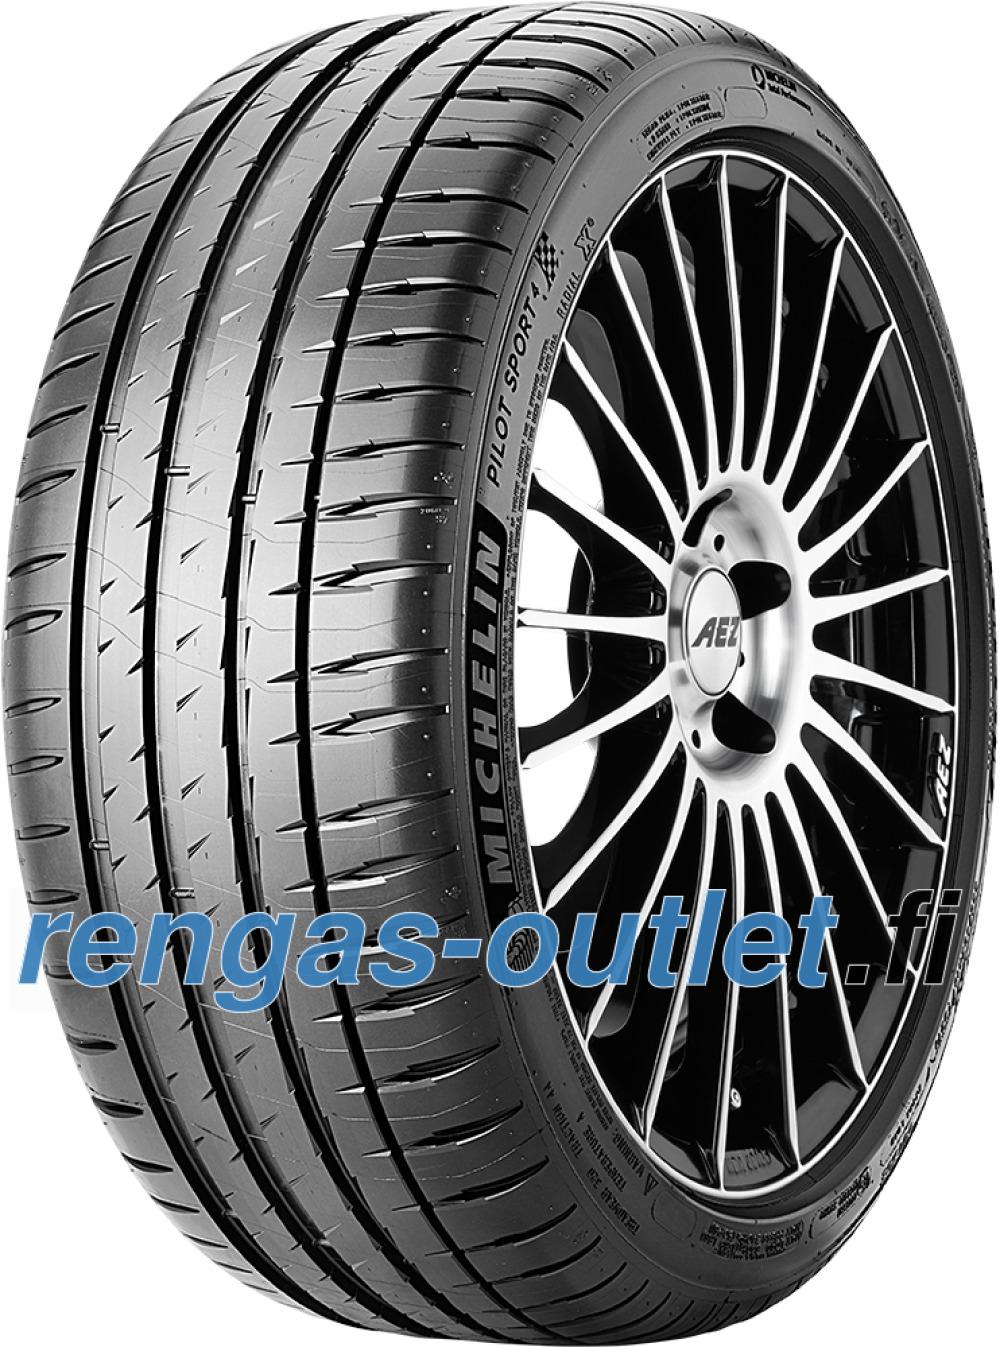 Michelin Pilot Sport 4 ( 245/40 ZR18 93Y AO, vanteen suojalistalla  (FSL) )